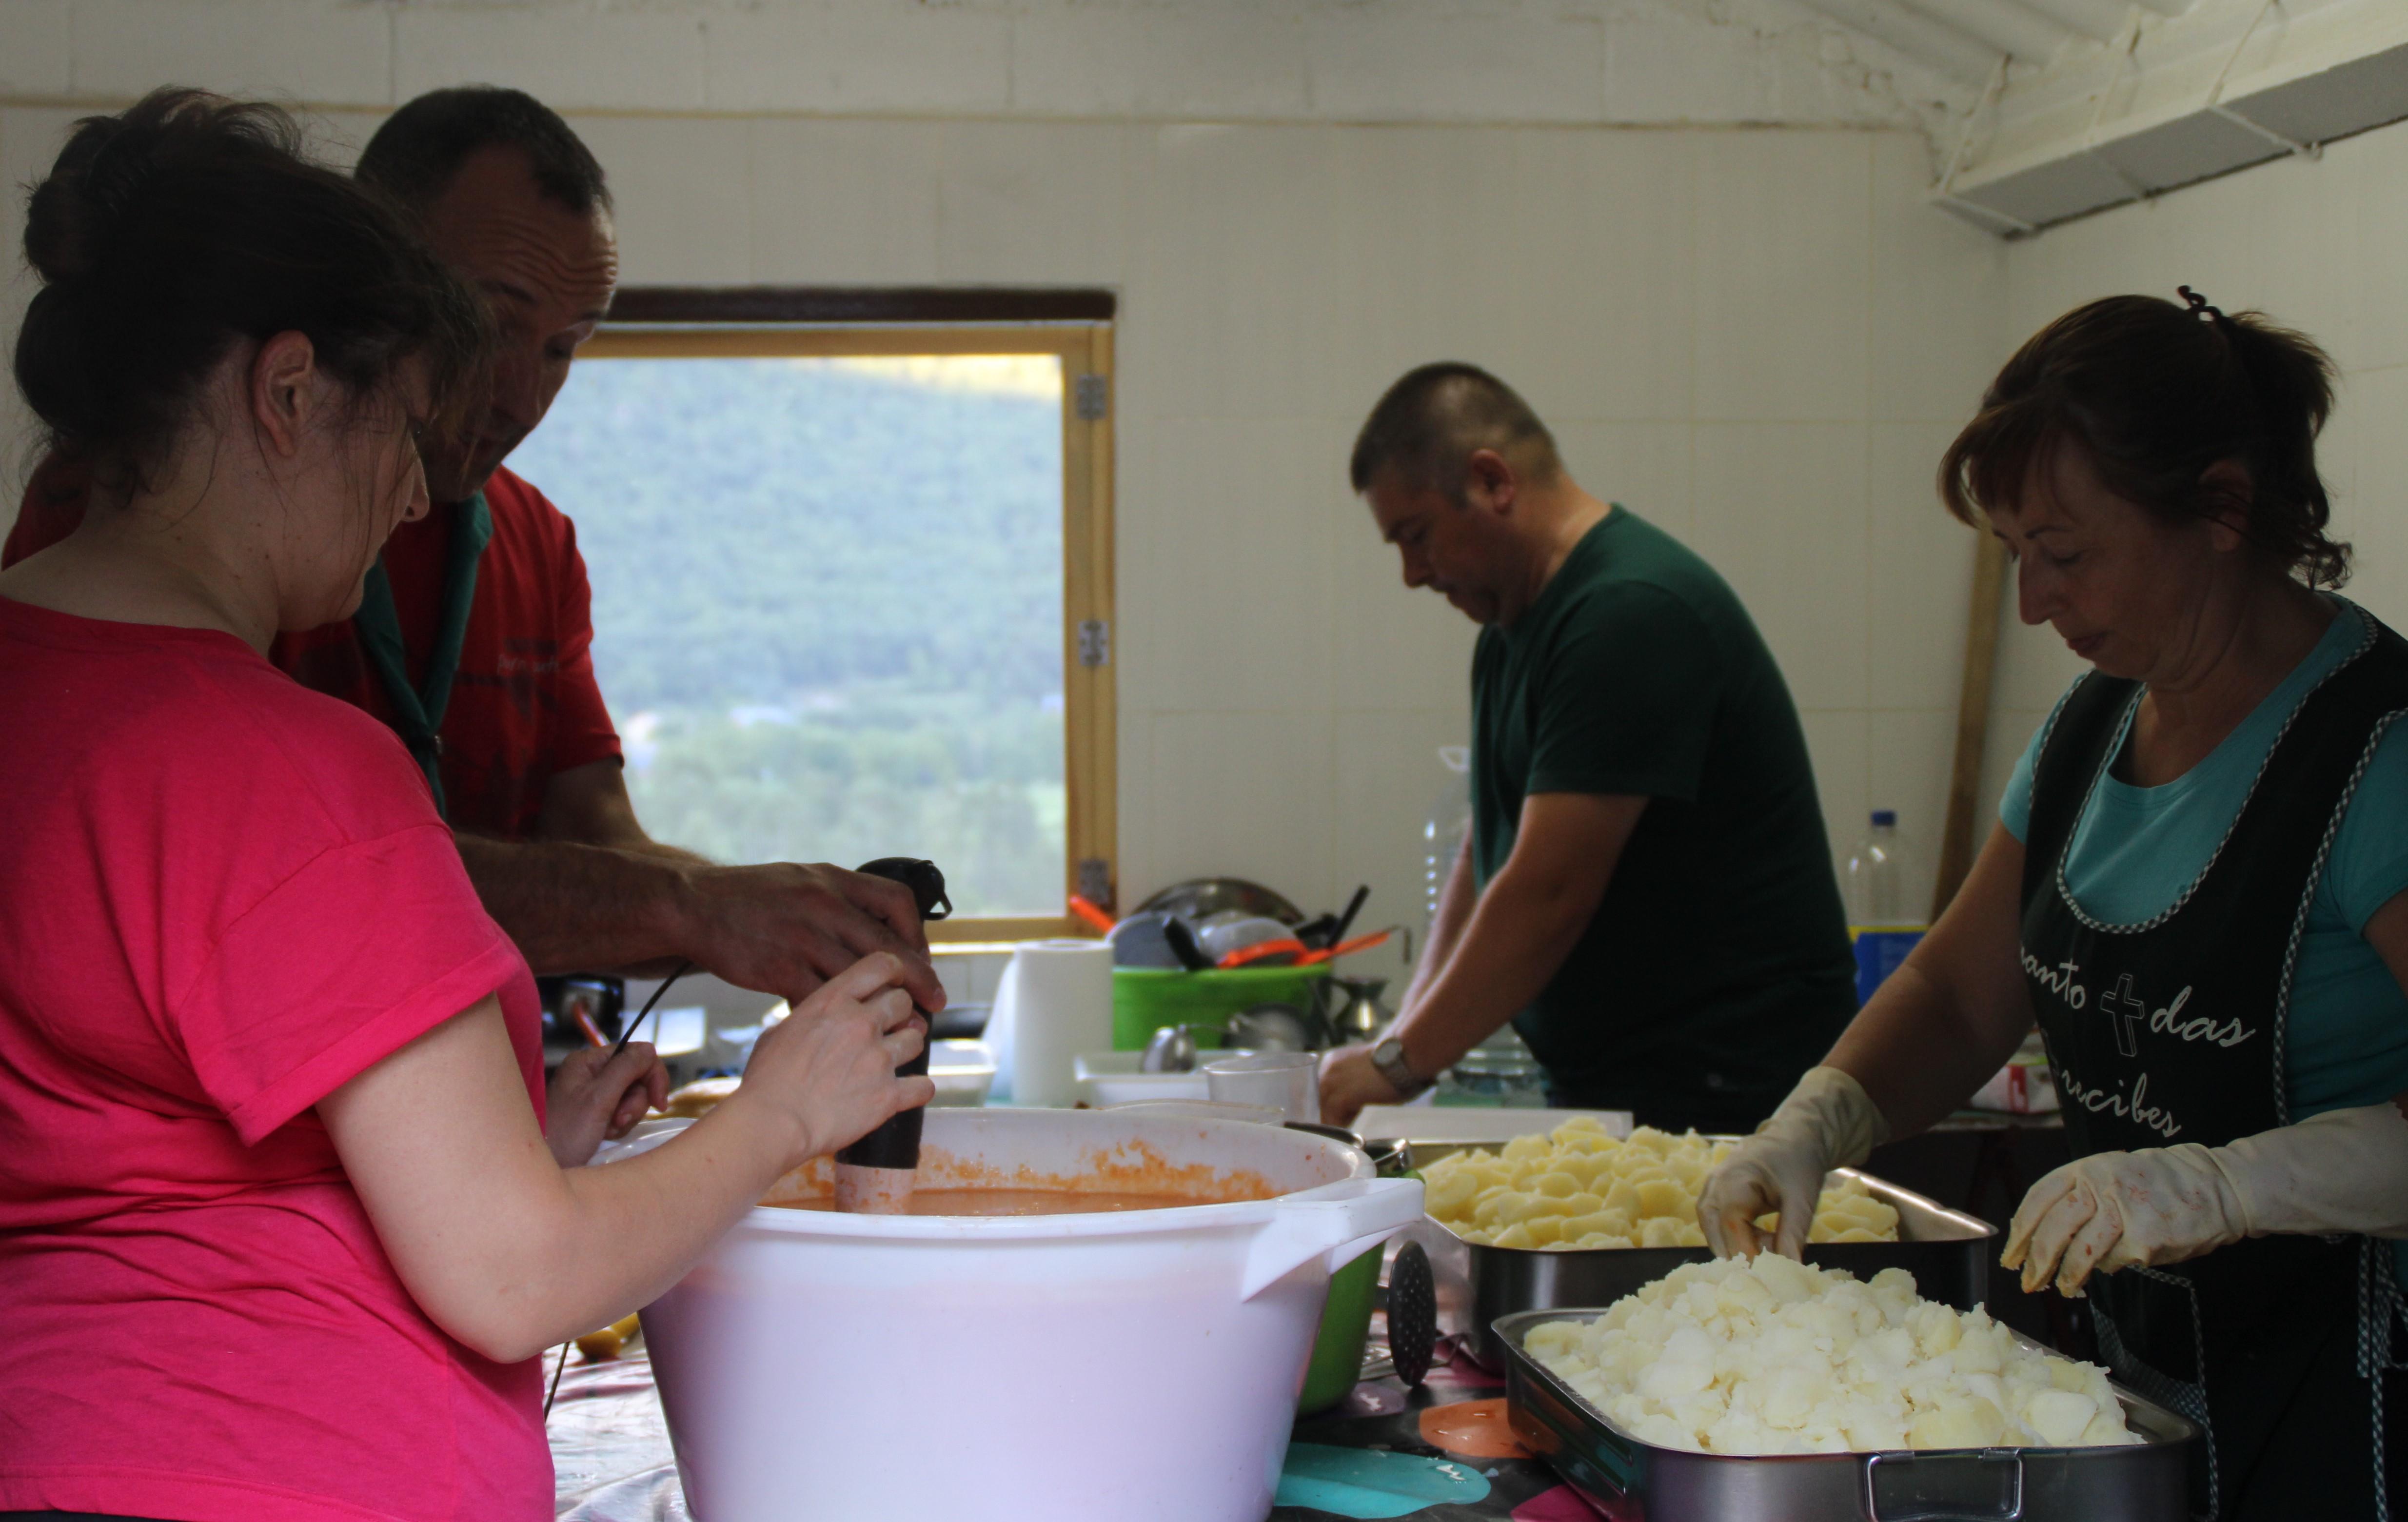 15-16 - Grupo - Campamento de verano - P261